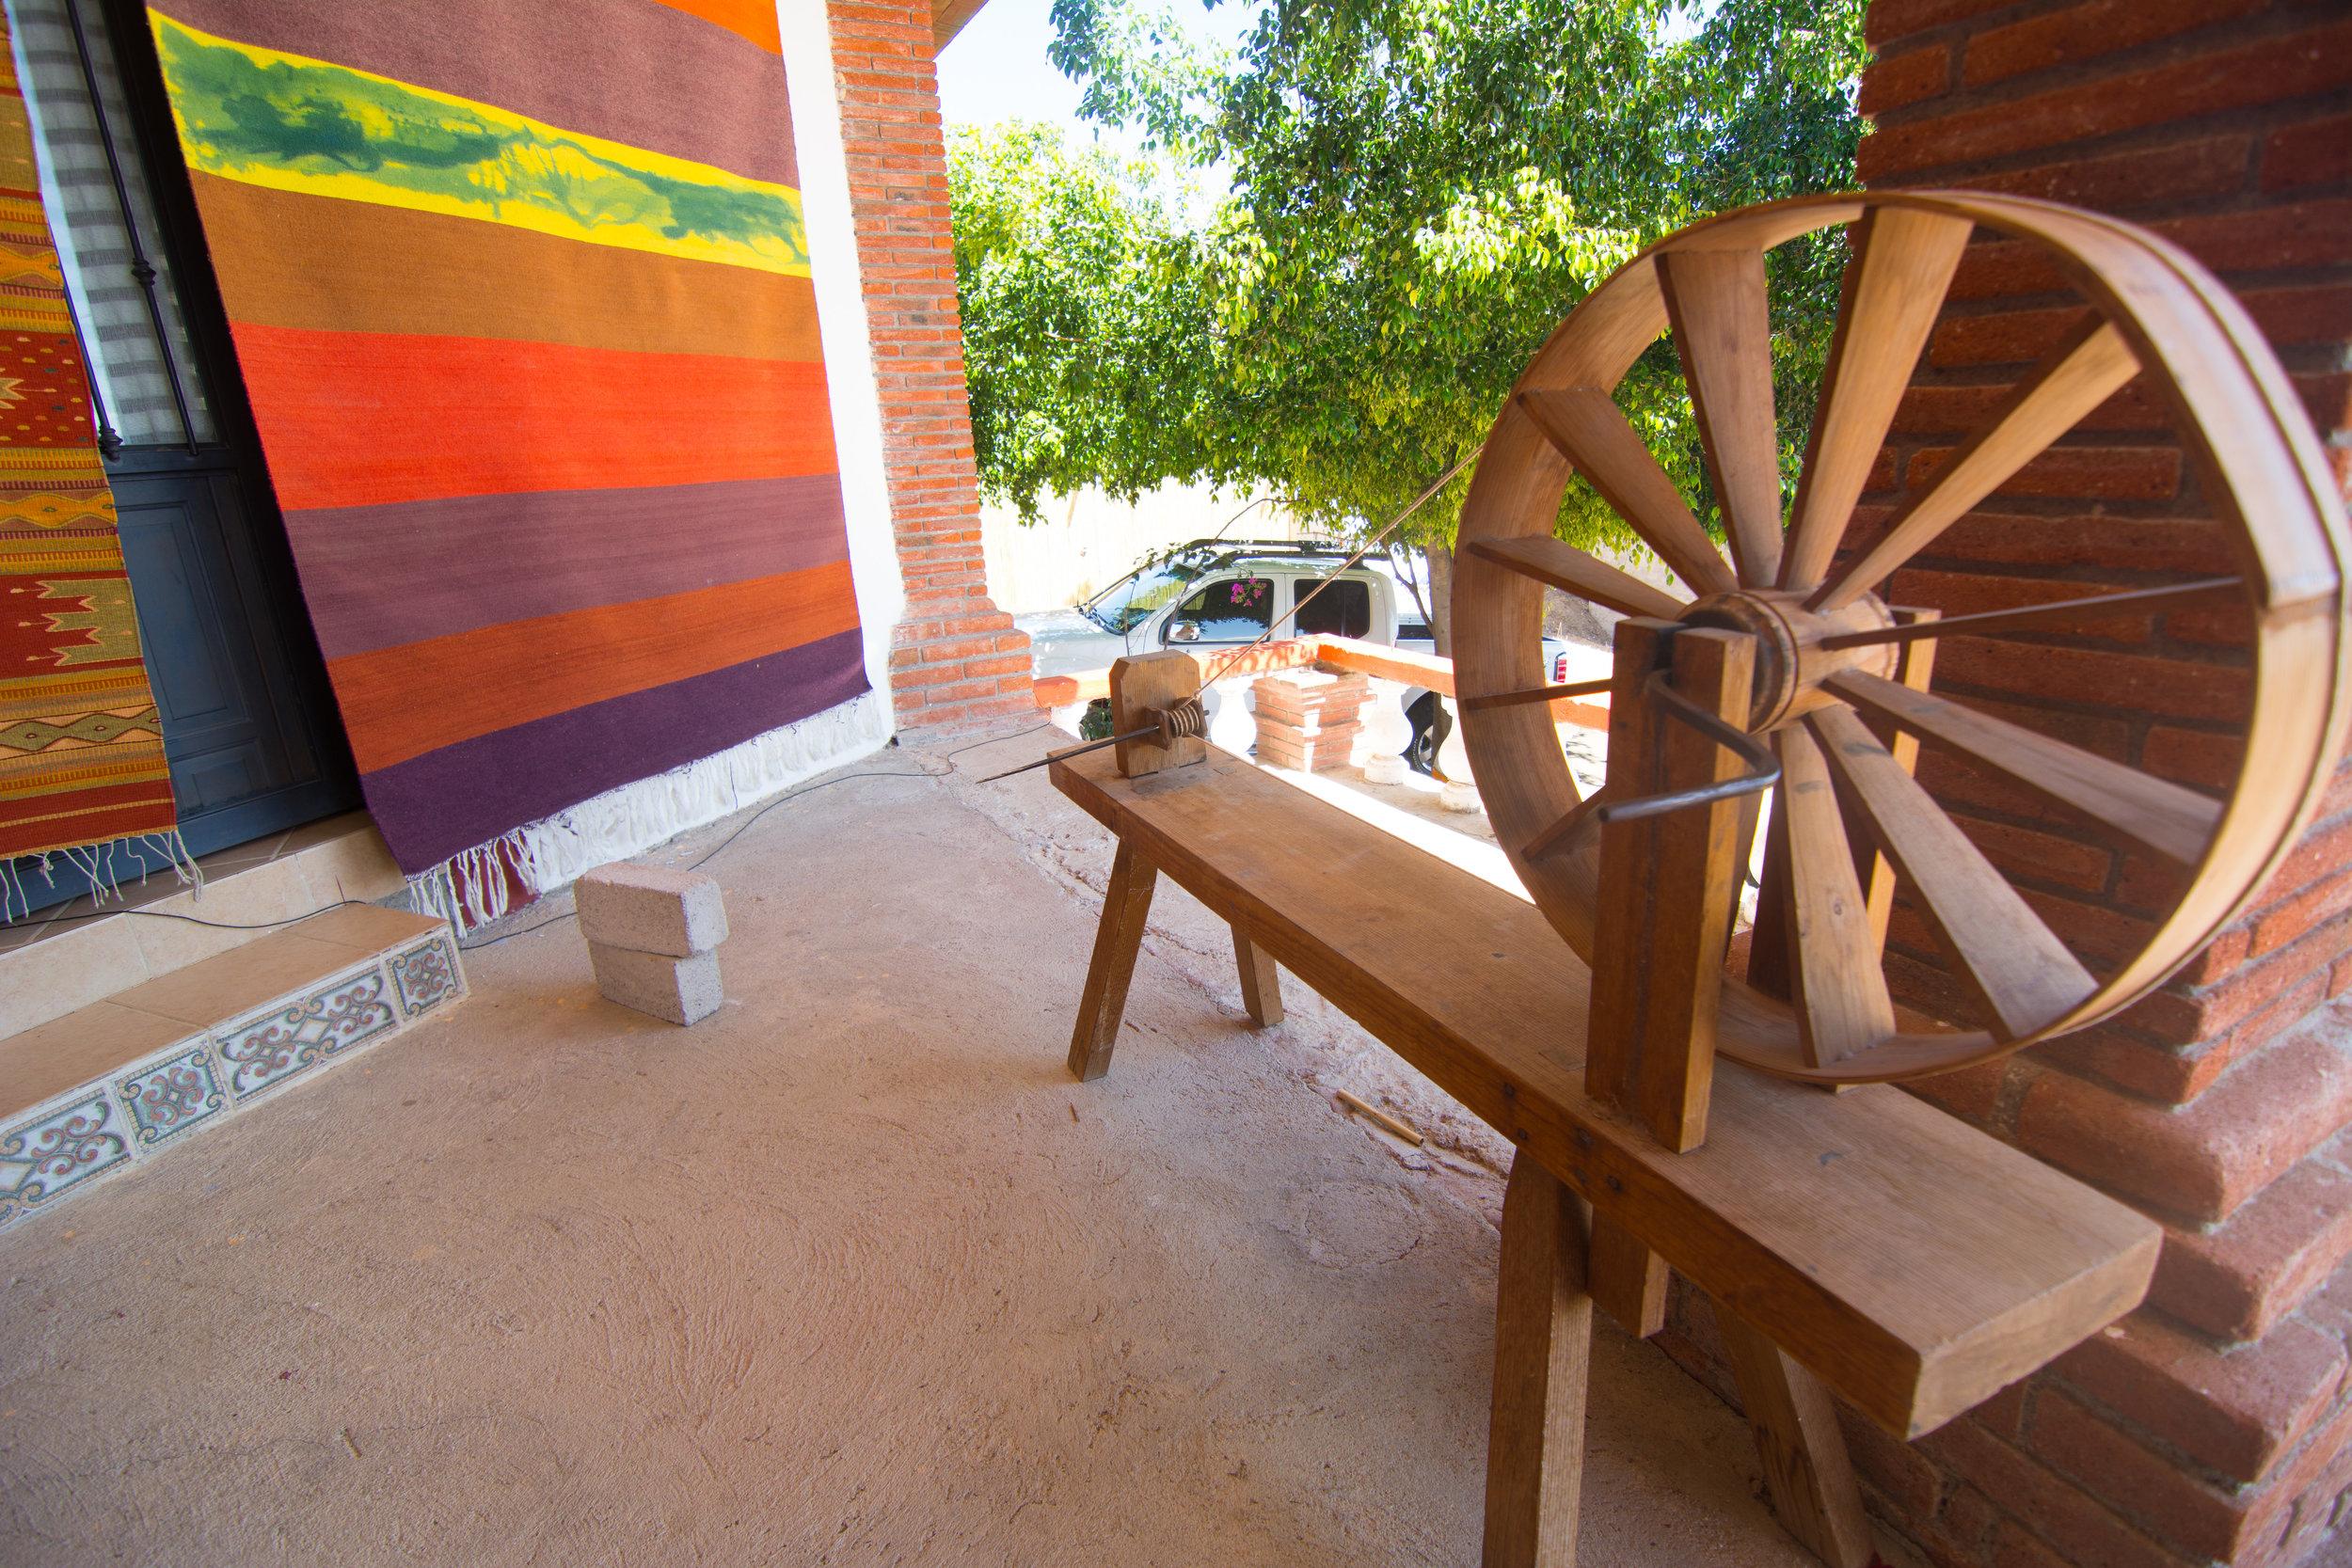 Oaxaca Artisanal rug and textile making